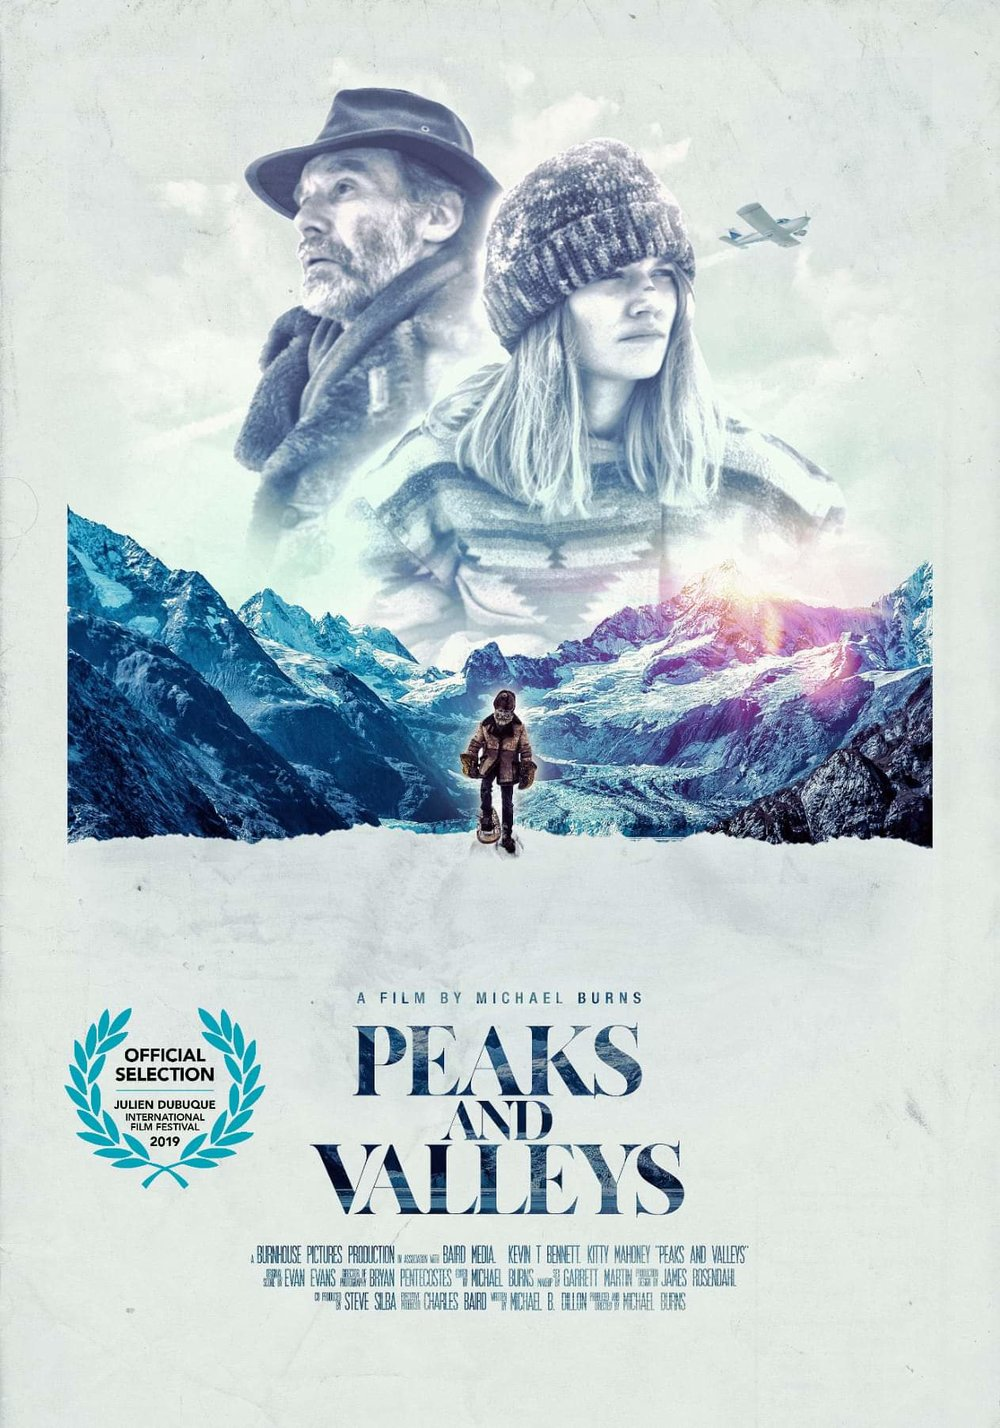 MAS - Alaska Gets a Sneak 'Peak' (5) WEB.jpg